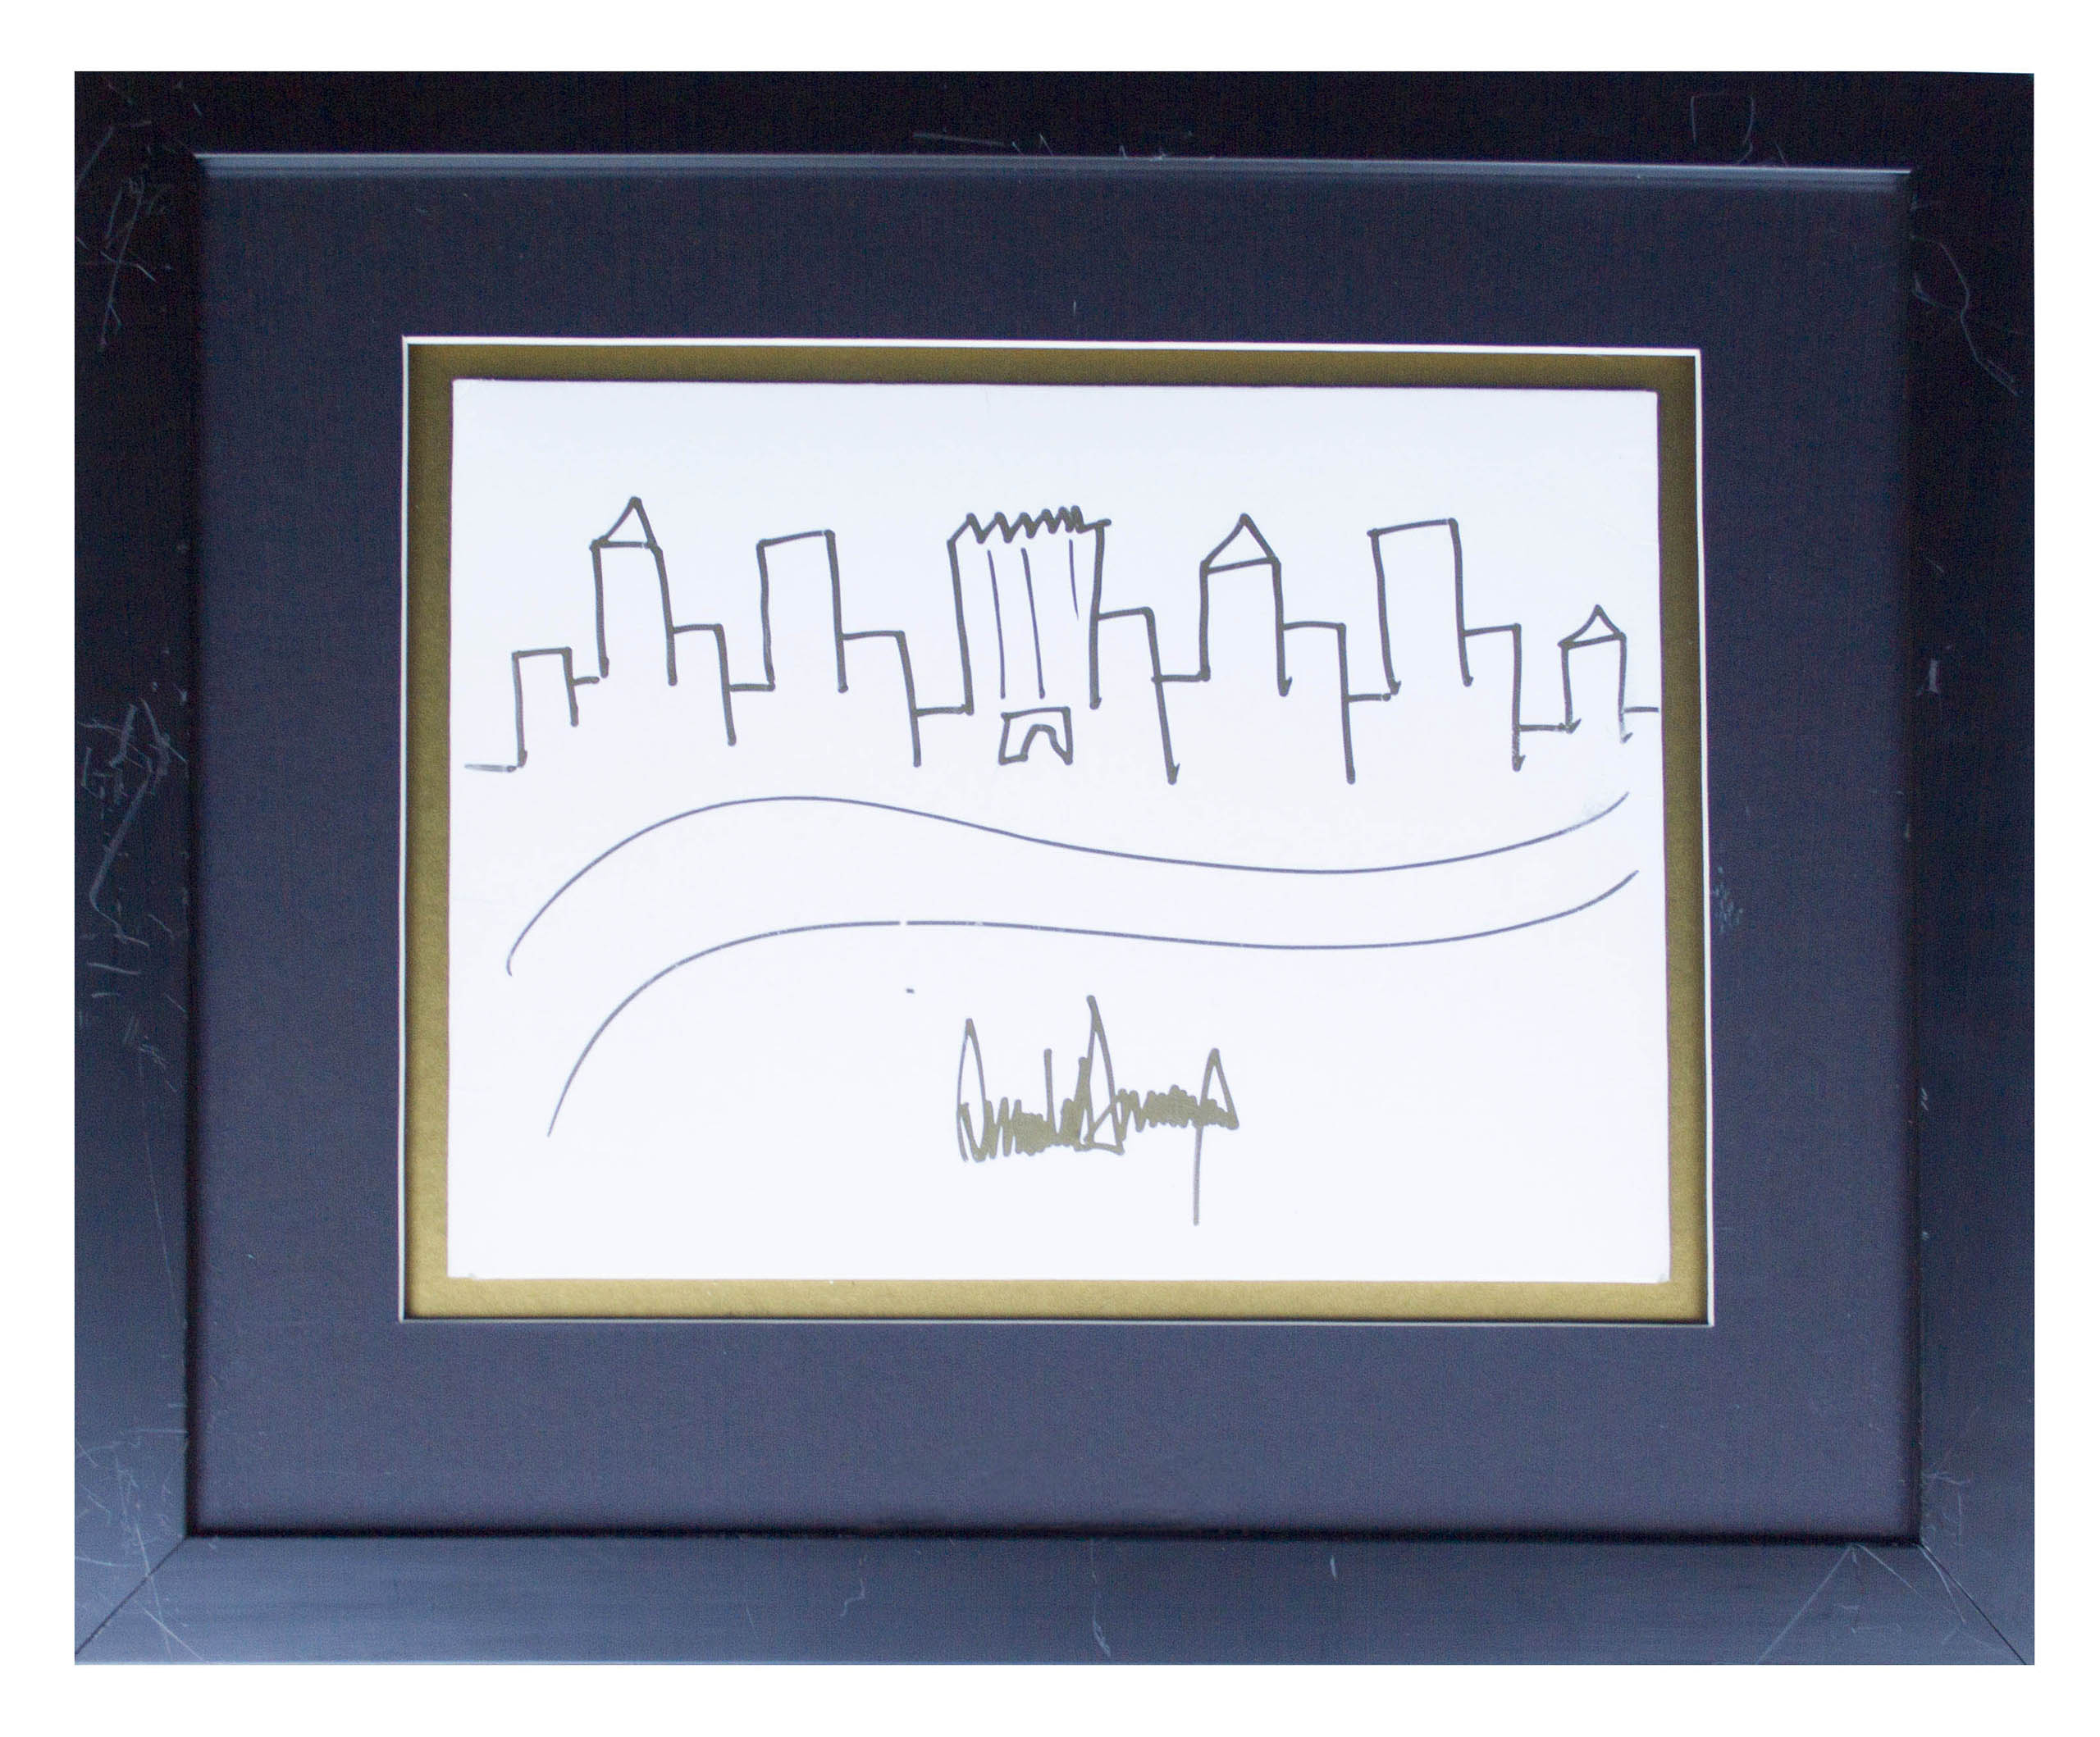 Trump's sketch of the New York City skyline.